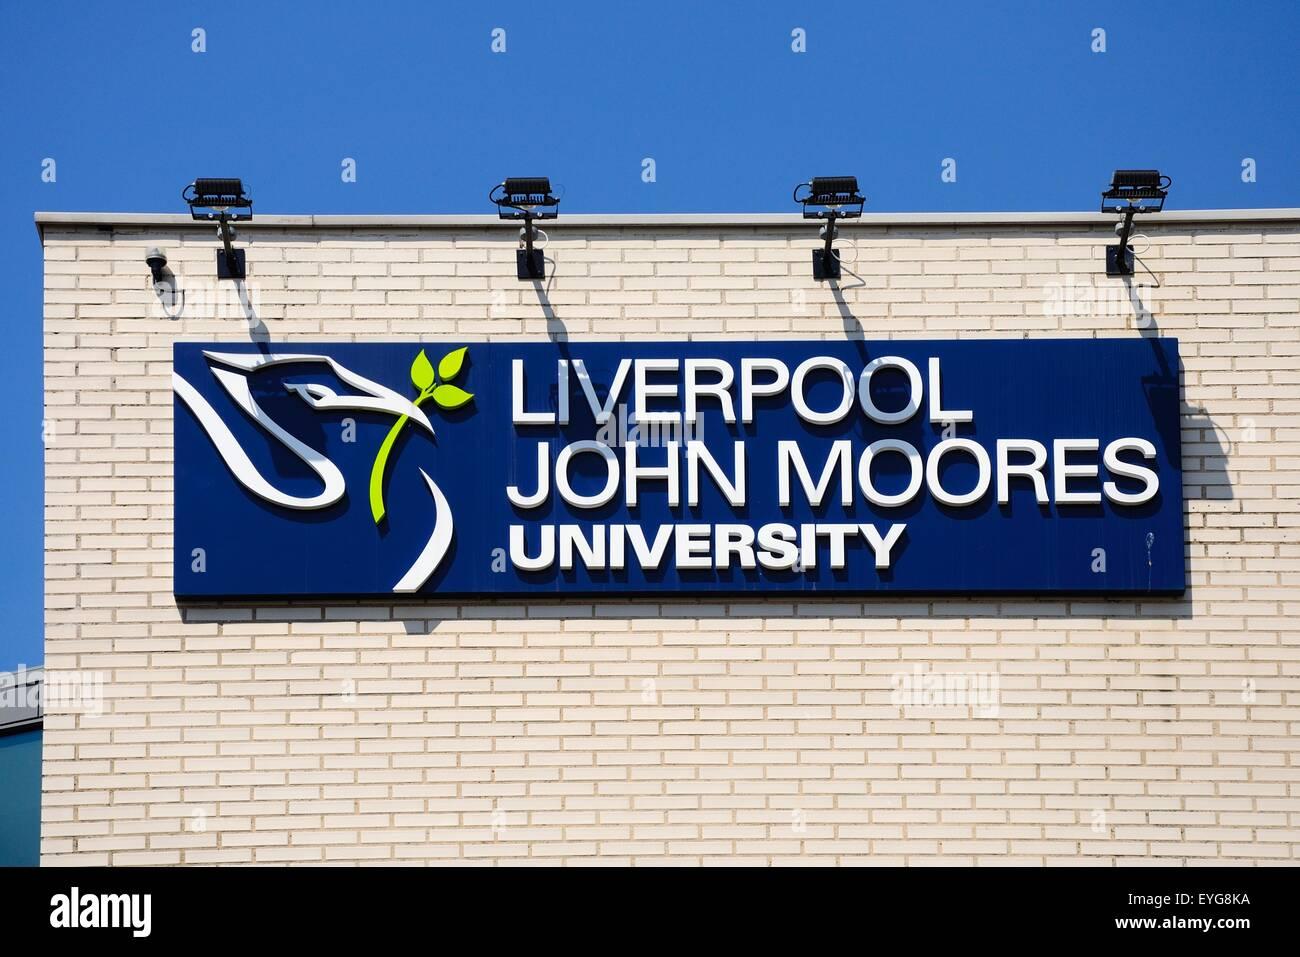 Liverpool John Moores University sign, Liverpool, Merseyside, England, UK, Western Europe. - Stock Image